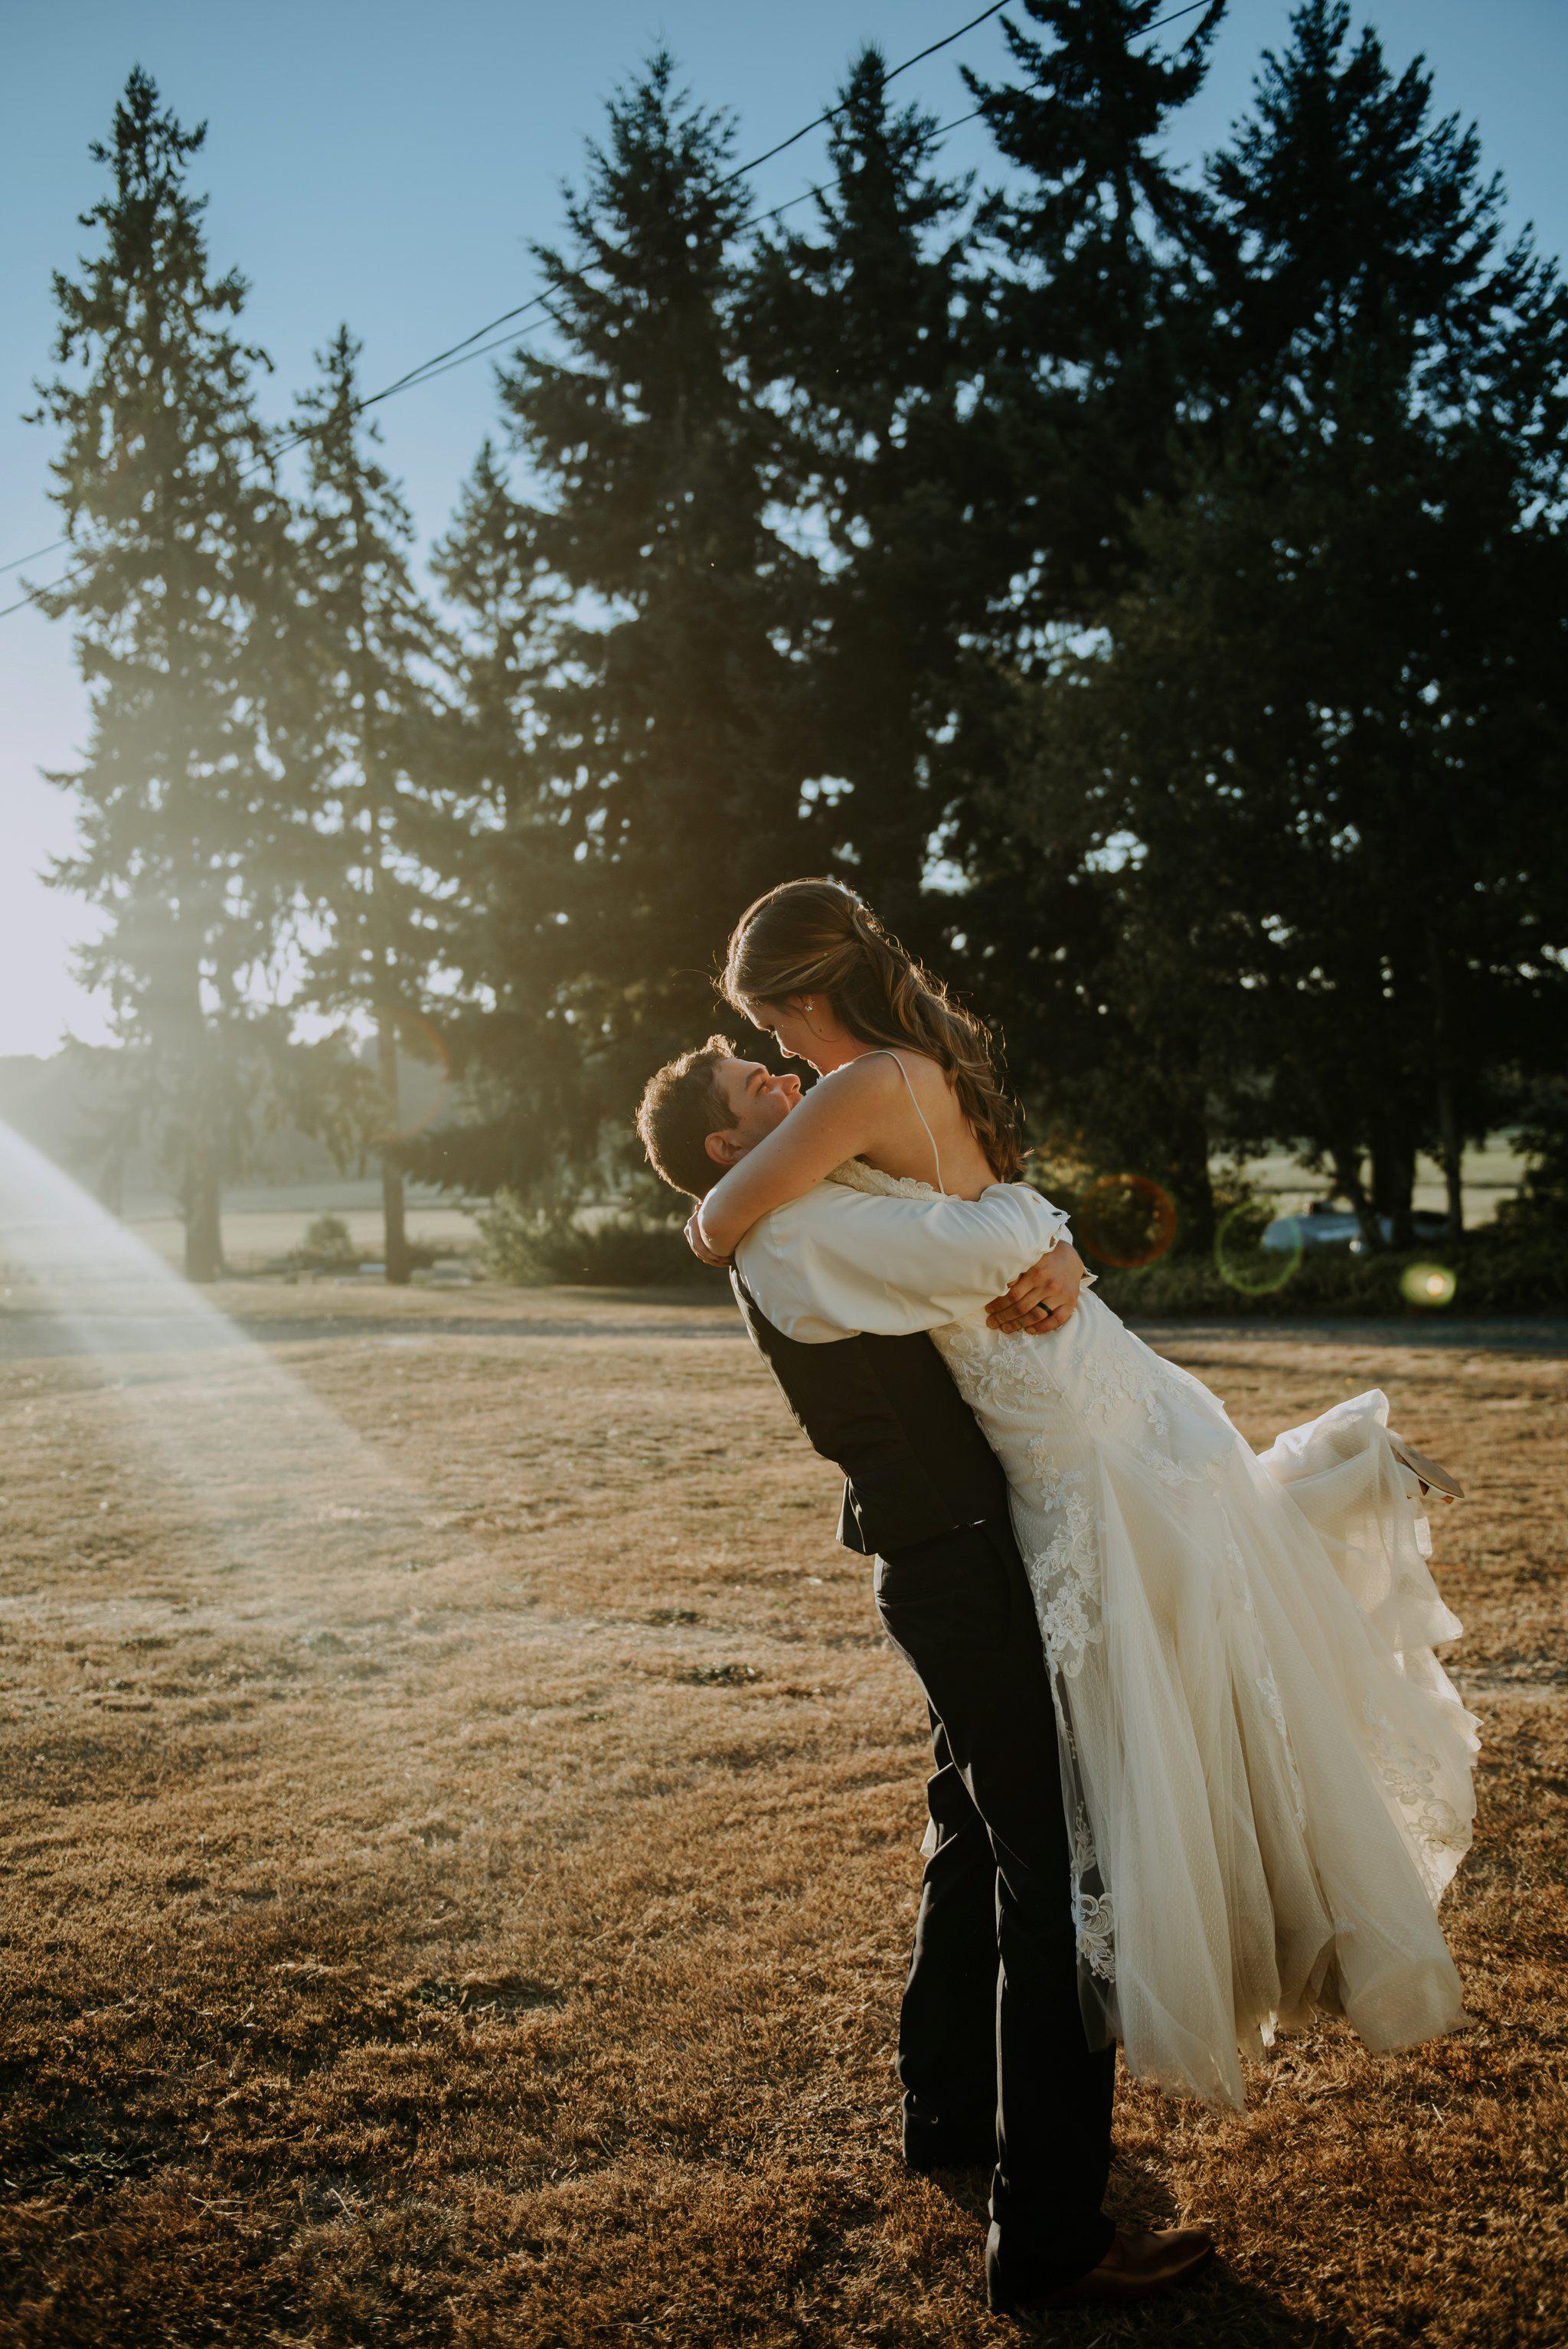 kristen-and-cody-the-kelley-farm-wedding-seattle-photographer-caitlyn-nikula-93.jpg